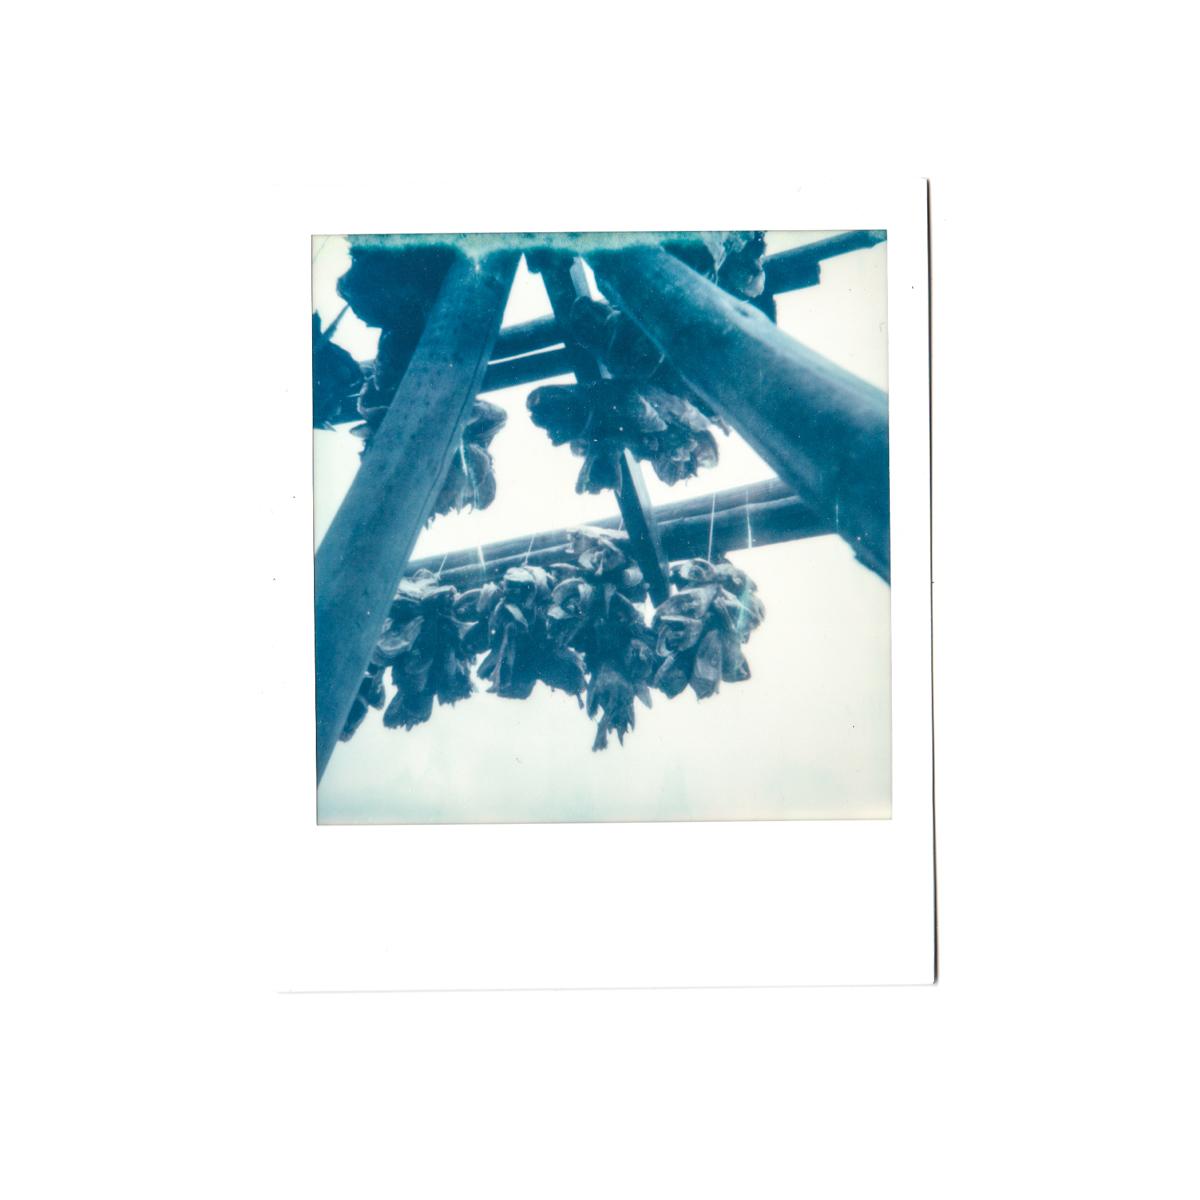 Magnolia_mountain_solvor_MT34-9.jpg